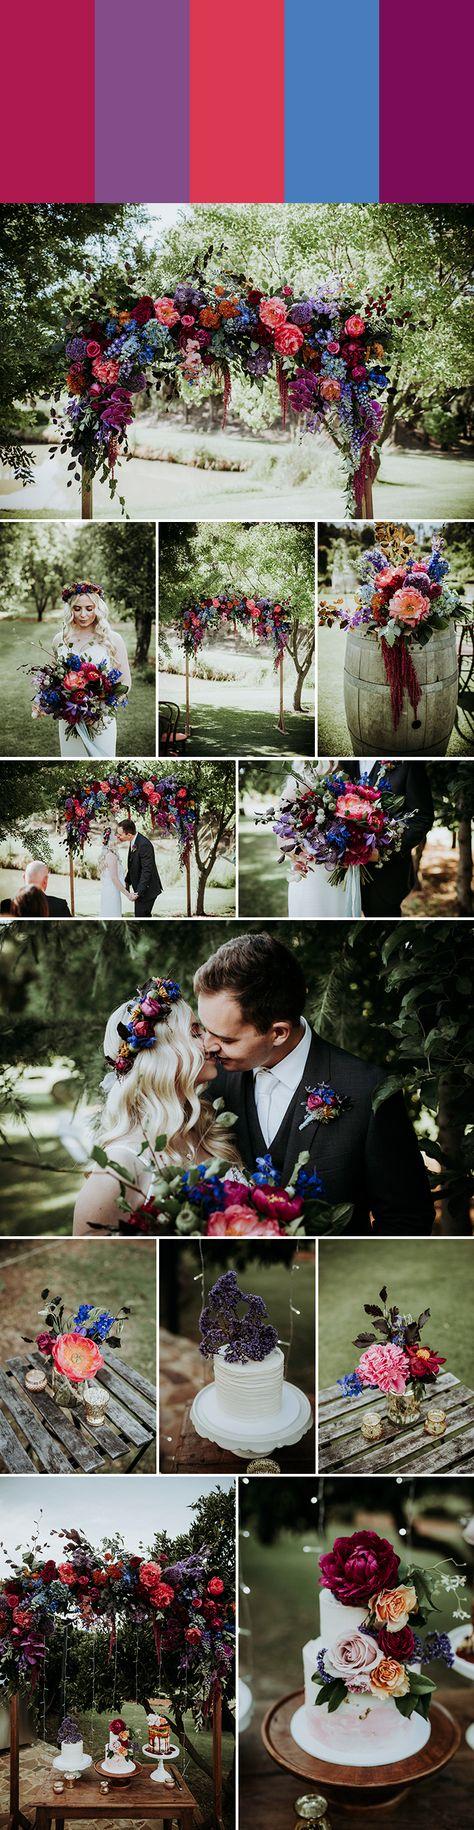 Winter peony + amethyst + peony + lapis + orchid | Images by Black Bird Tale #purplewedding #weddinginspiration #wedding #violetwedding #colorpalette #weddingcolorpalette #weddingplanning #weddingidea #weddingdecor #weddingceremony #weddingreception #bride #groom #cake